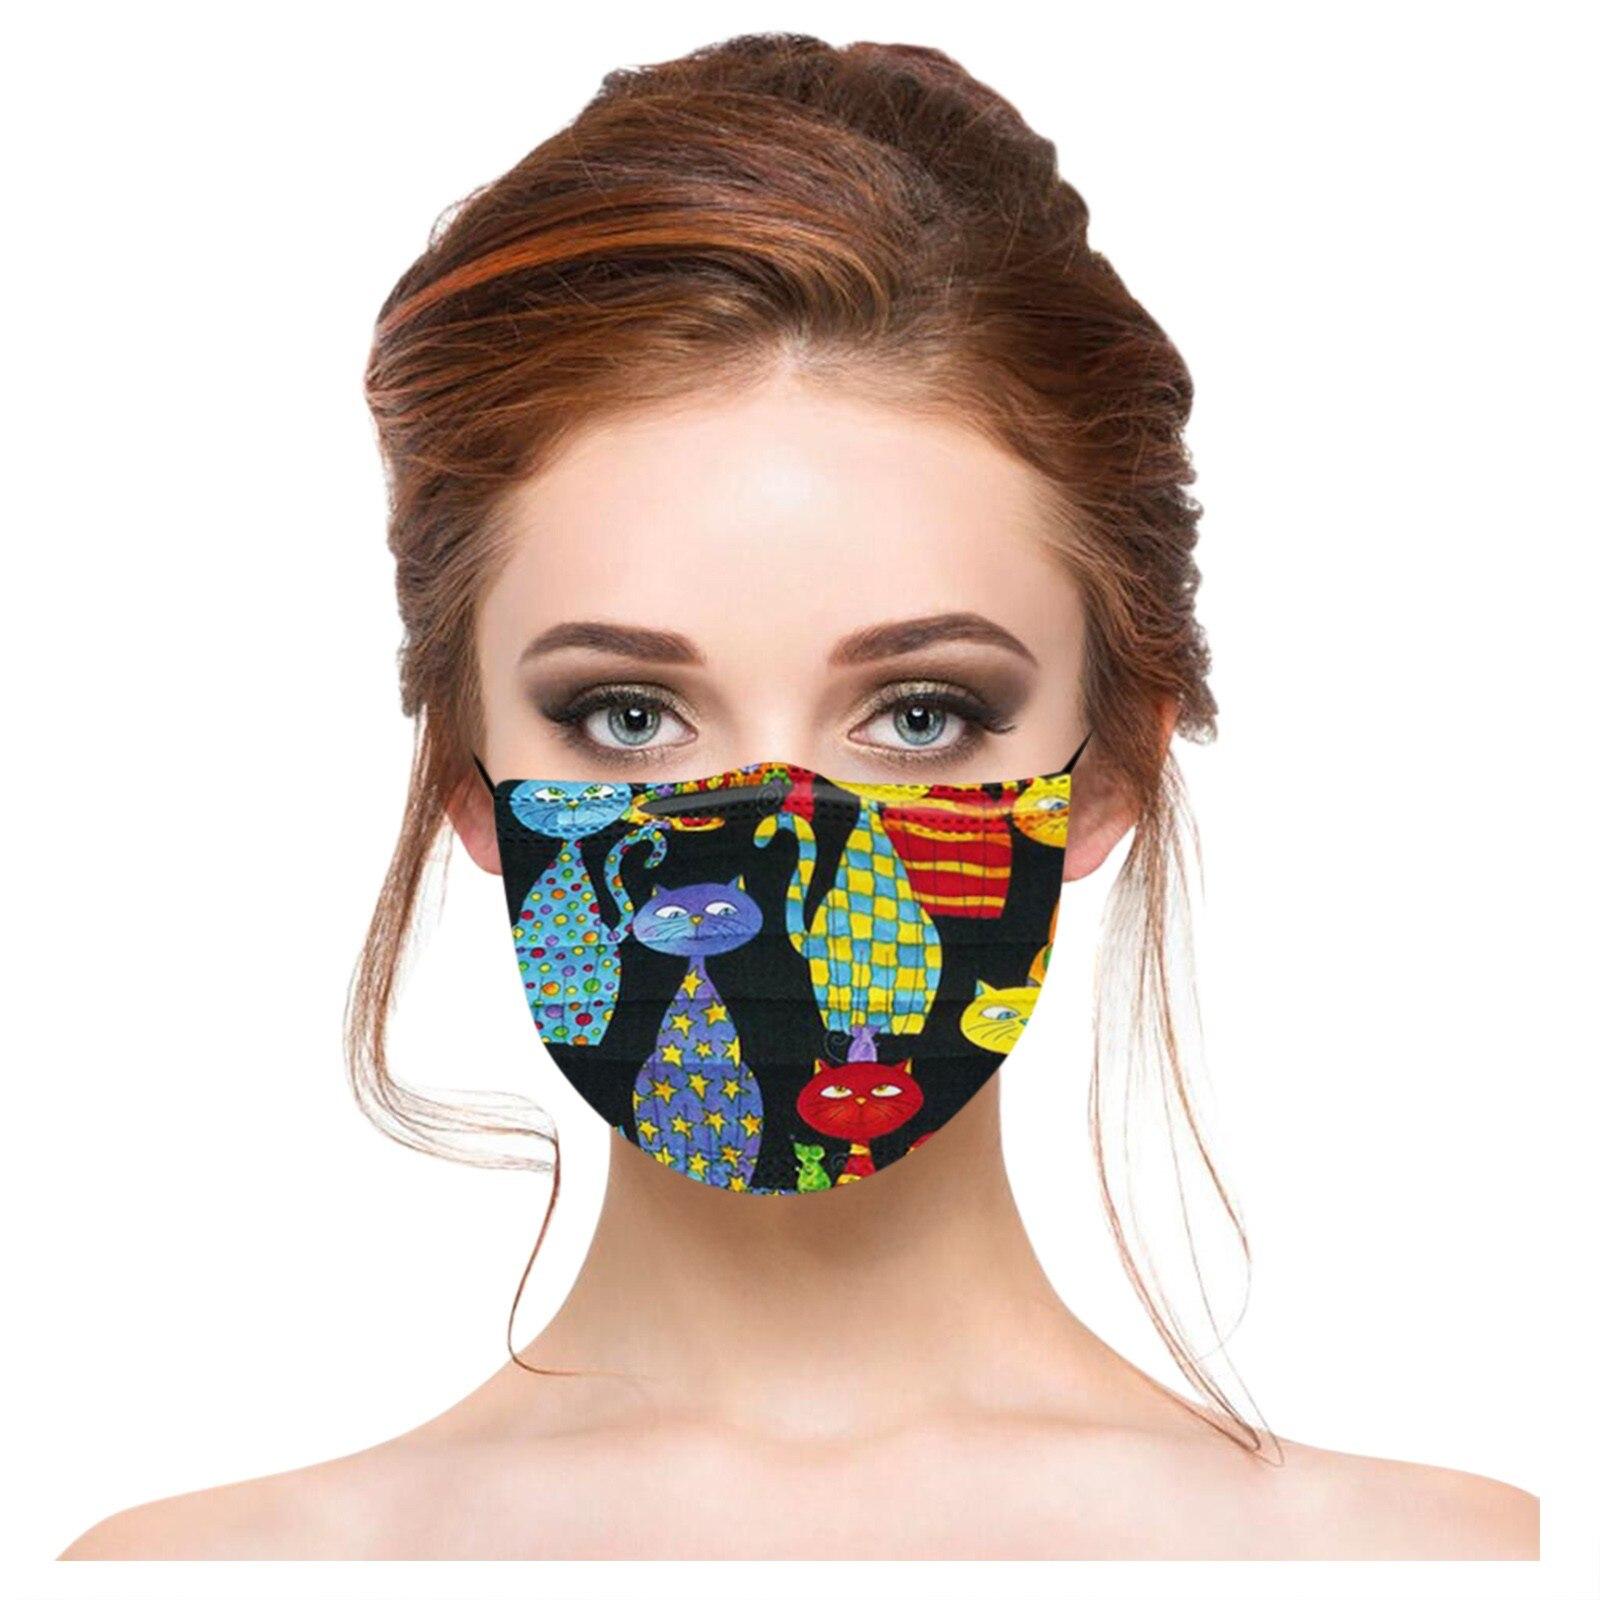 Masques adultes jetables Chats rigolos (lot de 20) divers coloris